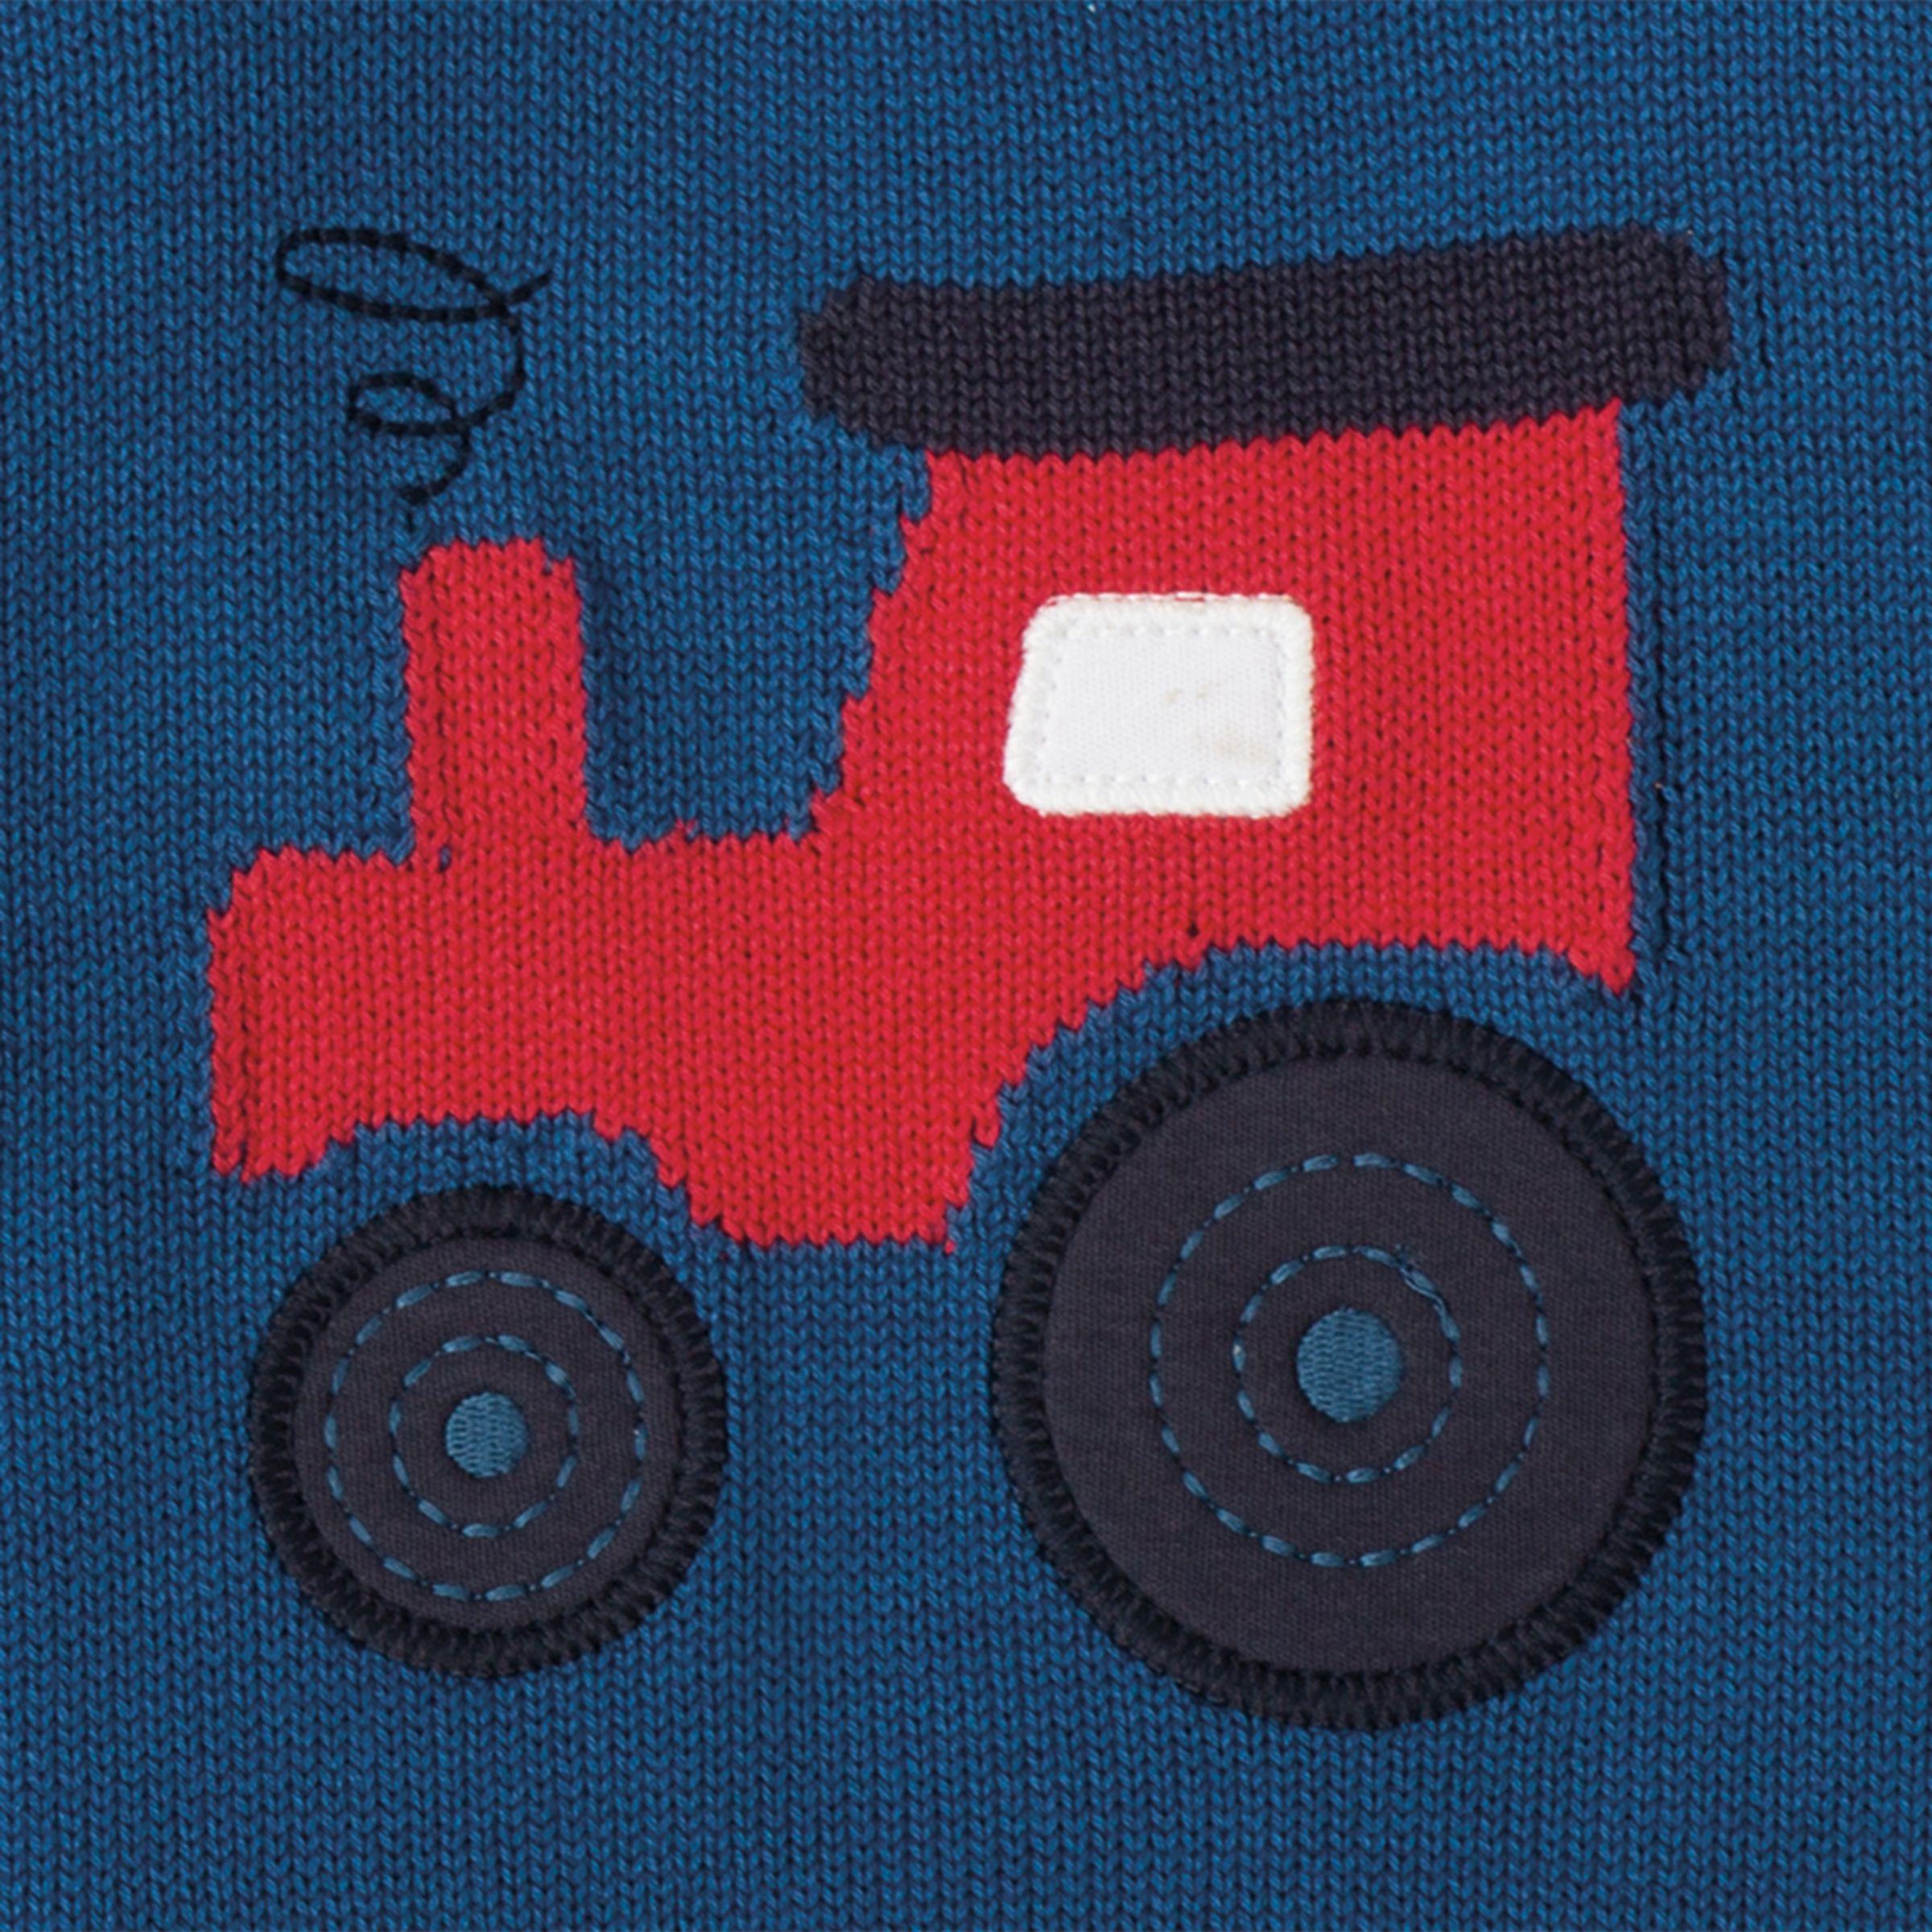 Knitting Pattern Tractor Jumper : Buy Frugi Organic Baby Jack Knitted Tractor Jumper, Navy John Lewis